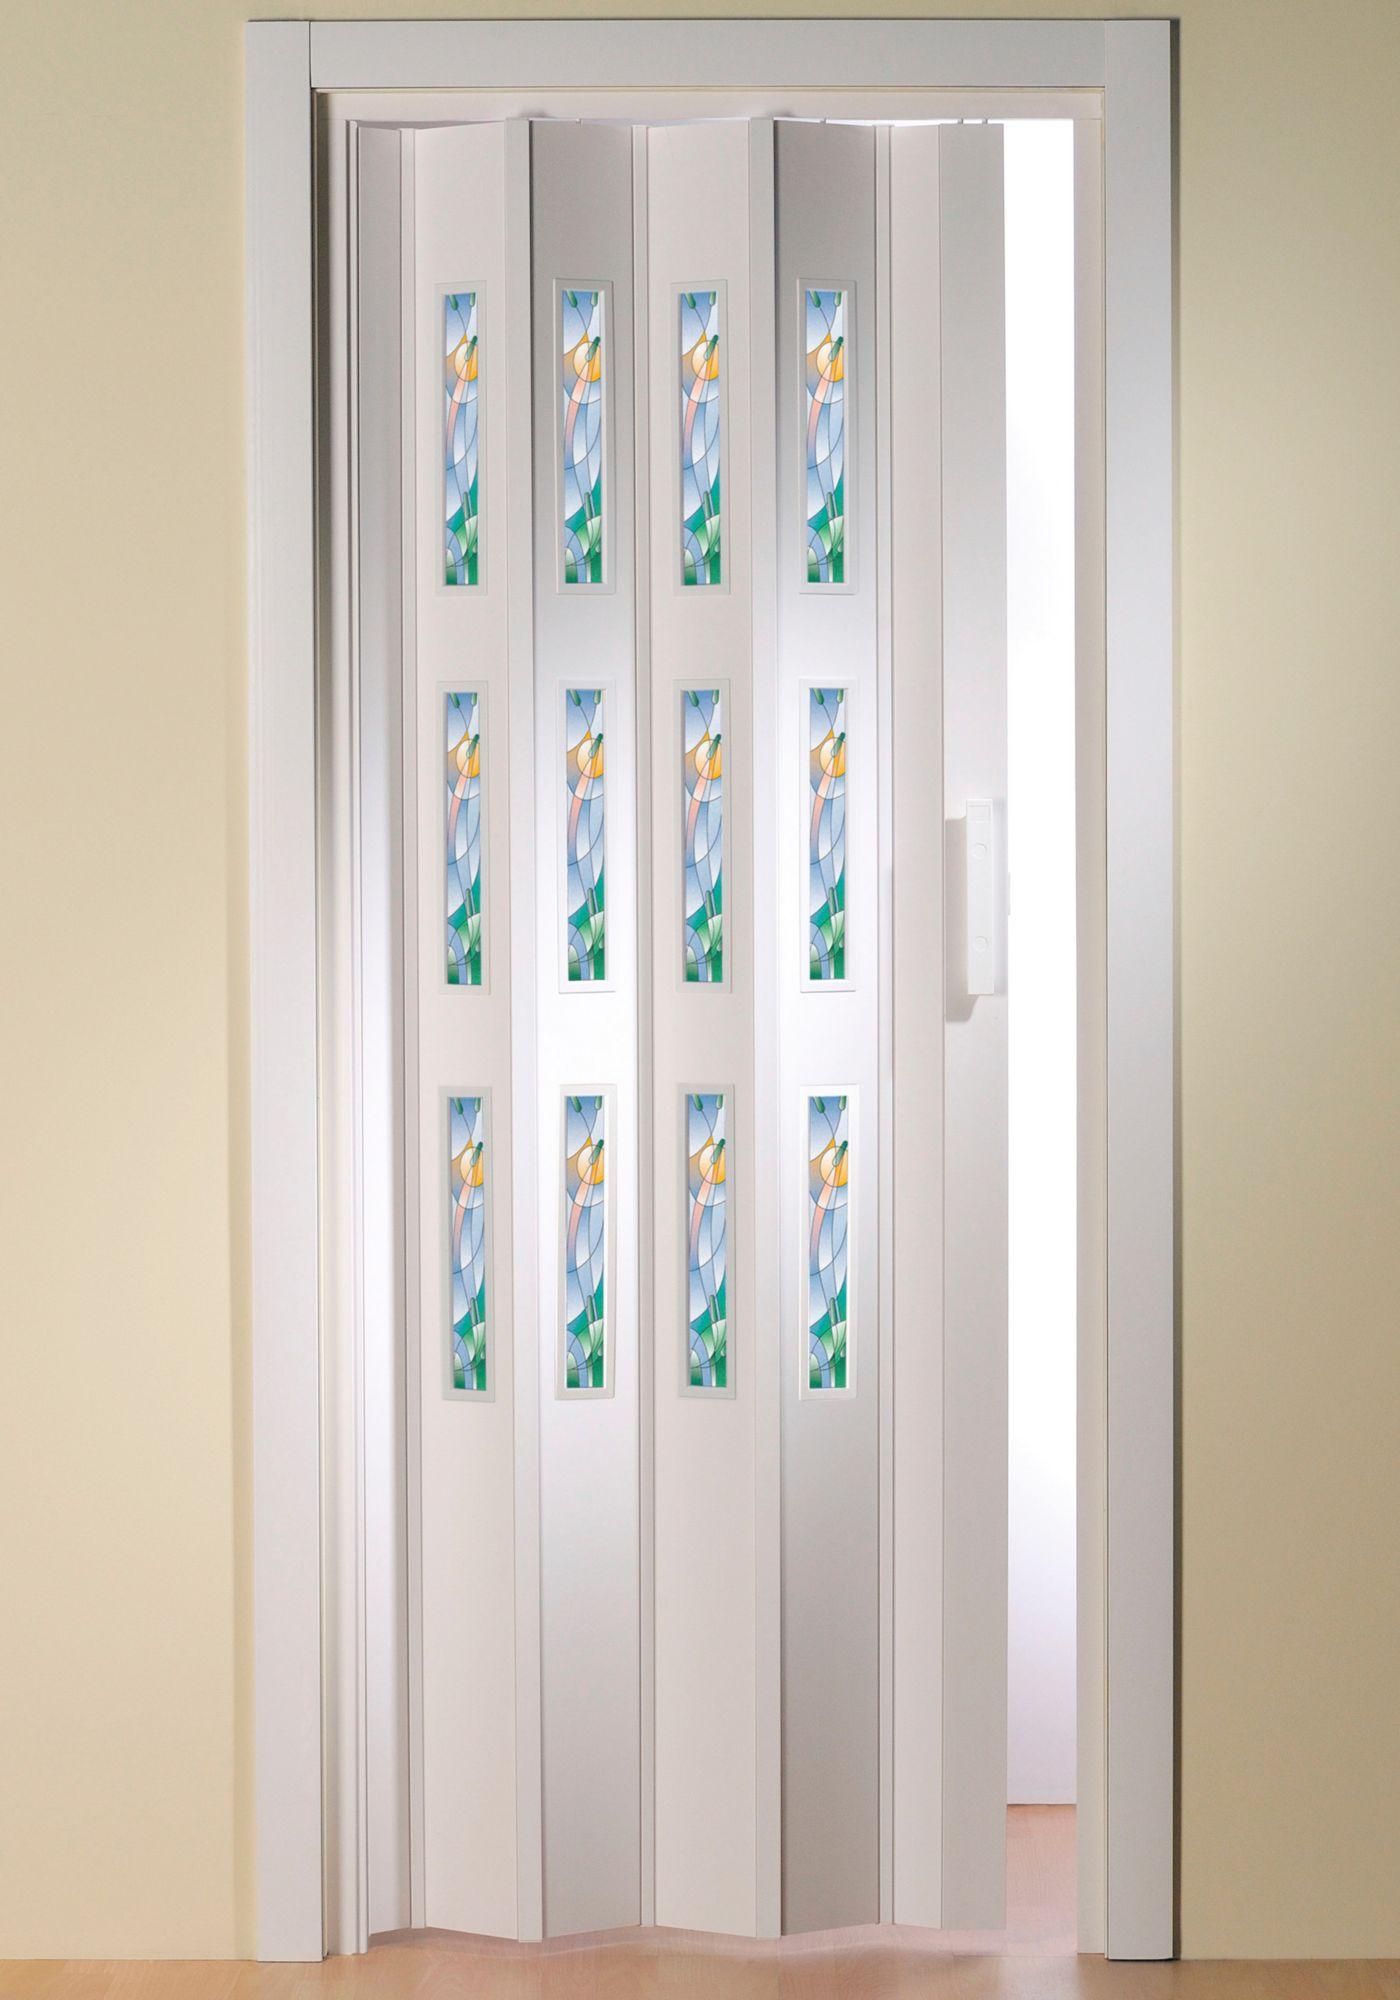 Kunststoff-Falttür »Dekor 5 Mosaik«, BxH: 88,5x202 cm, mit dekorativem Motiv im Fenster